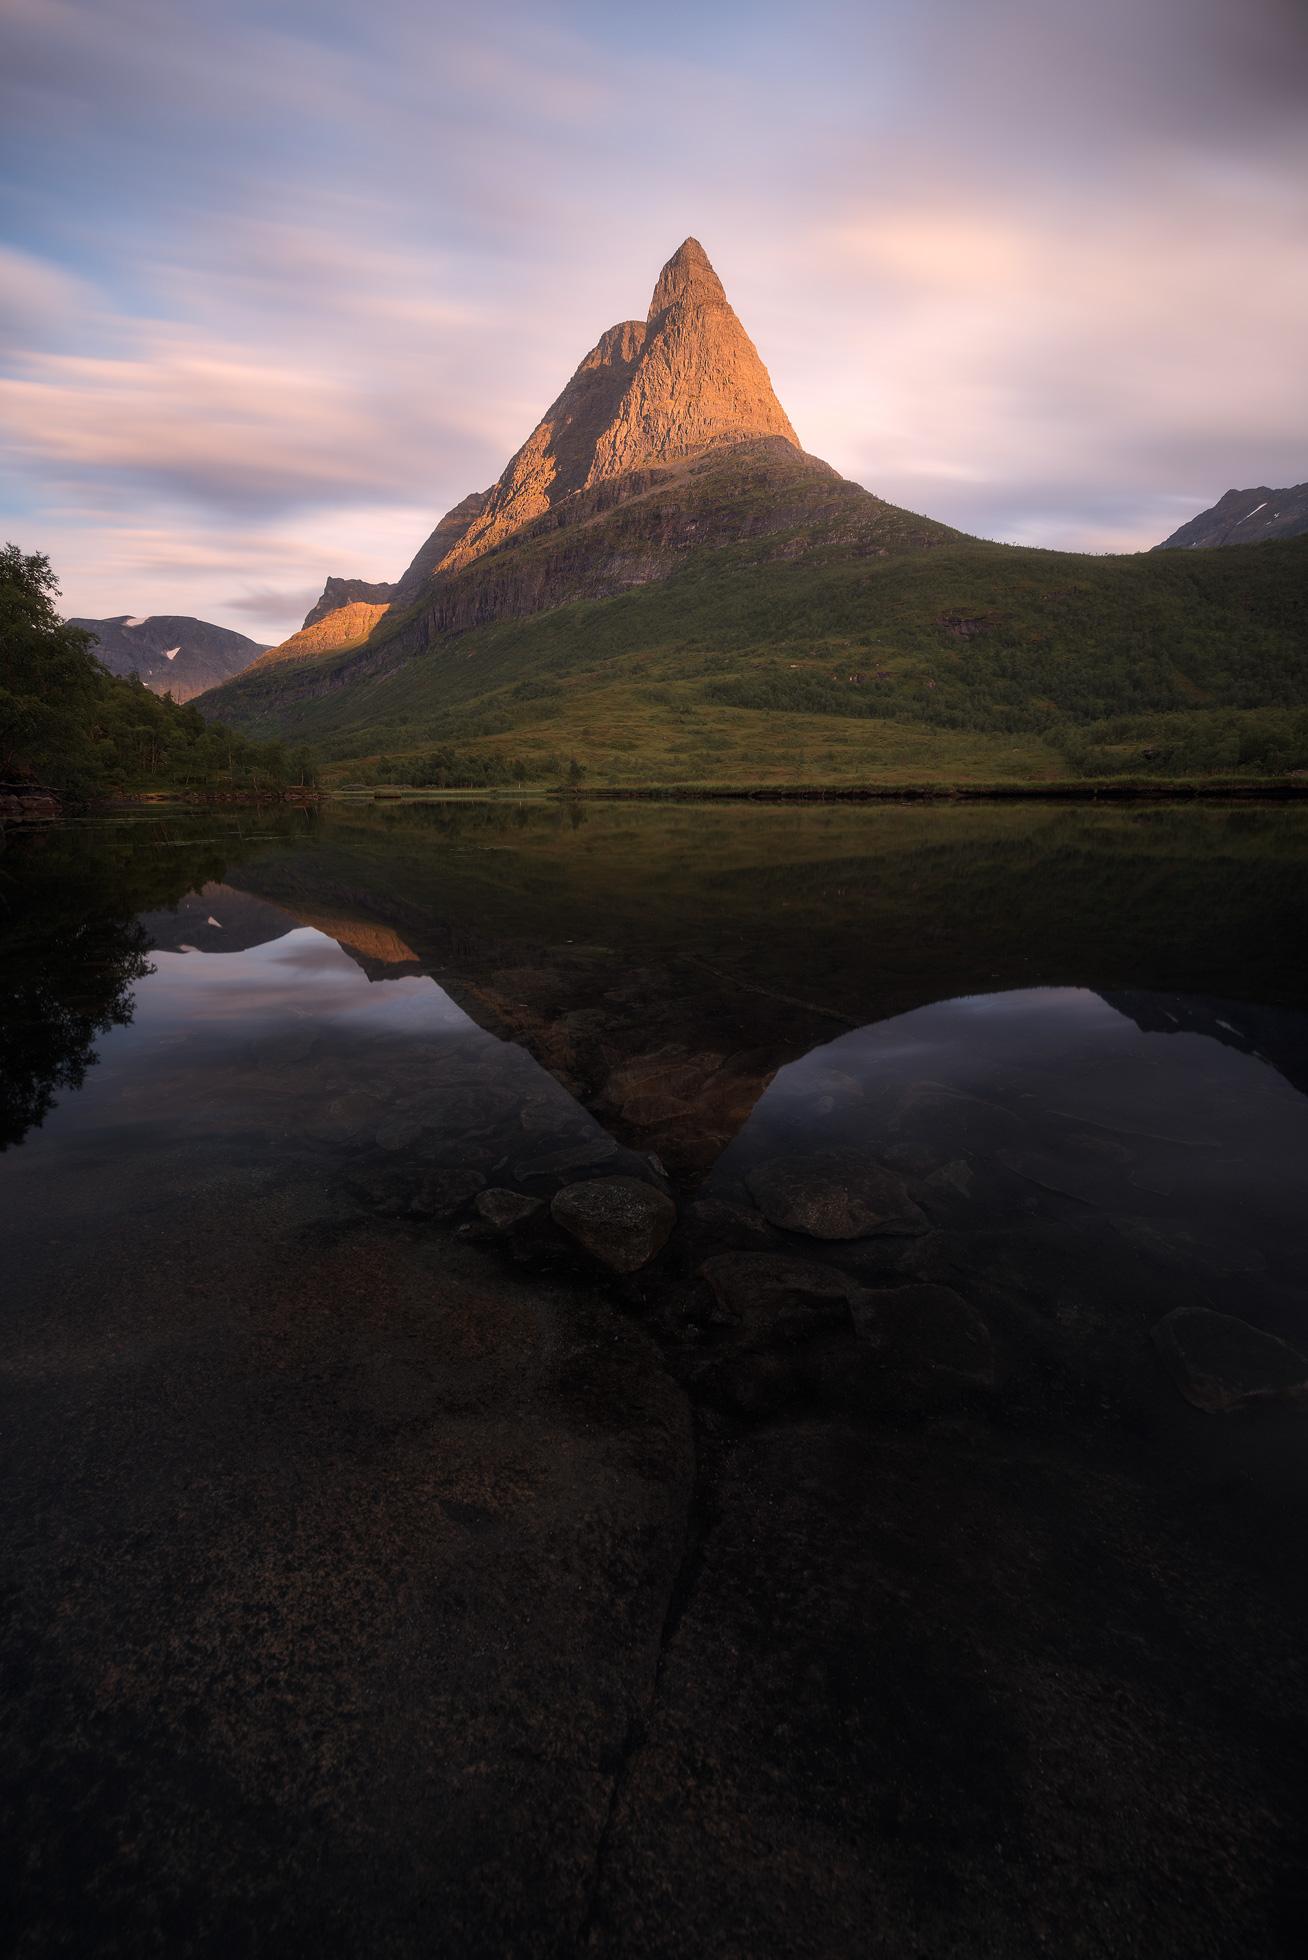 Norway-Innerdalen-Sunset.jpg